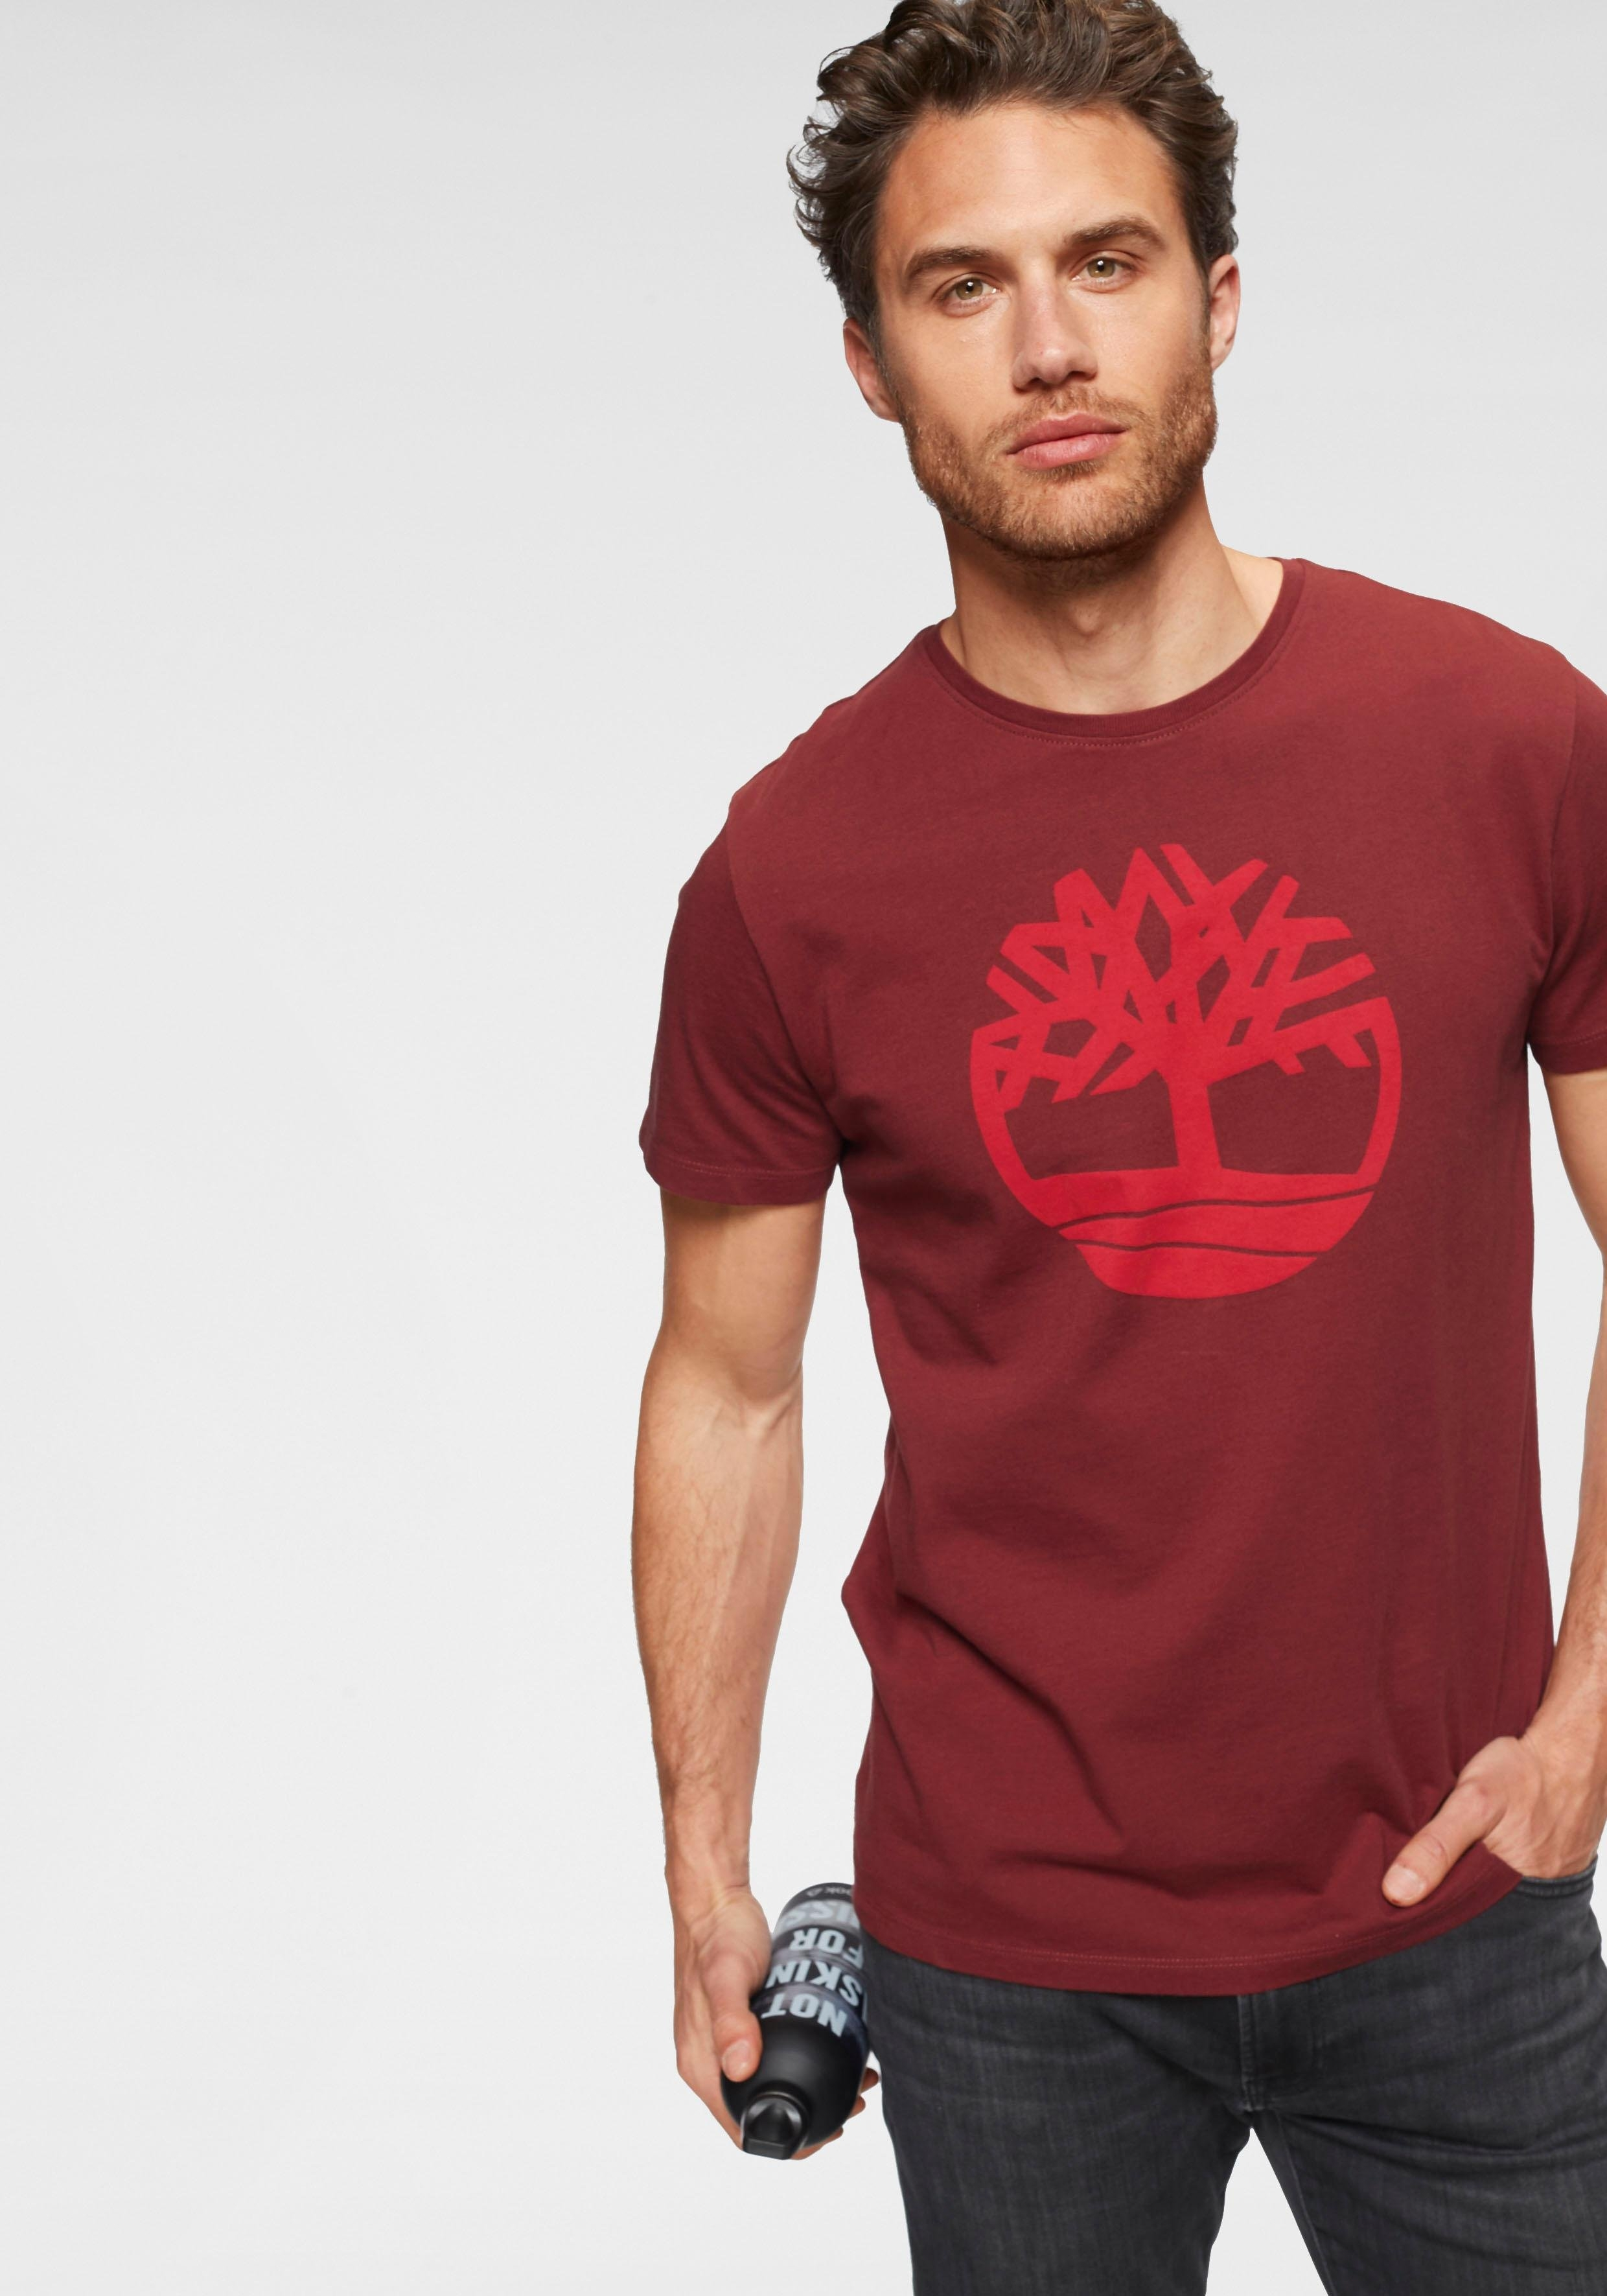 Timberland T-shirt bestellen: 14 dagen bedenktijd